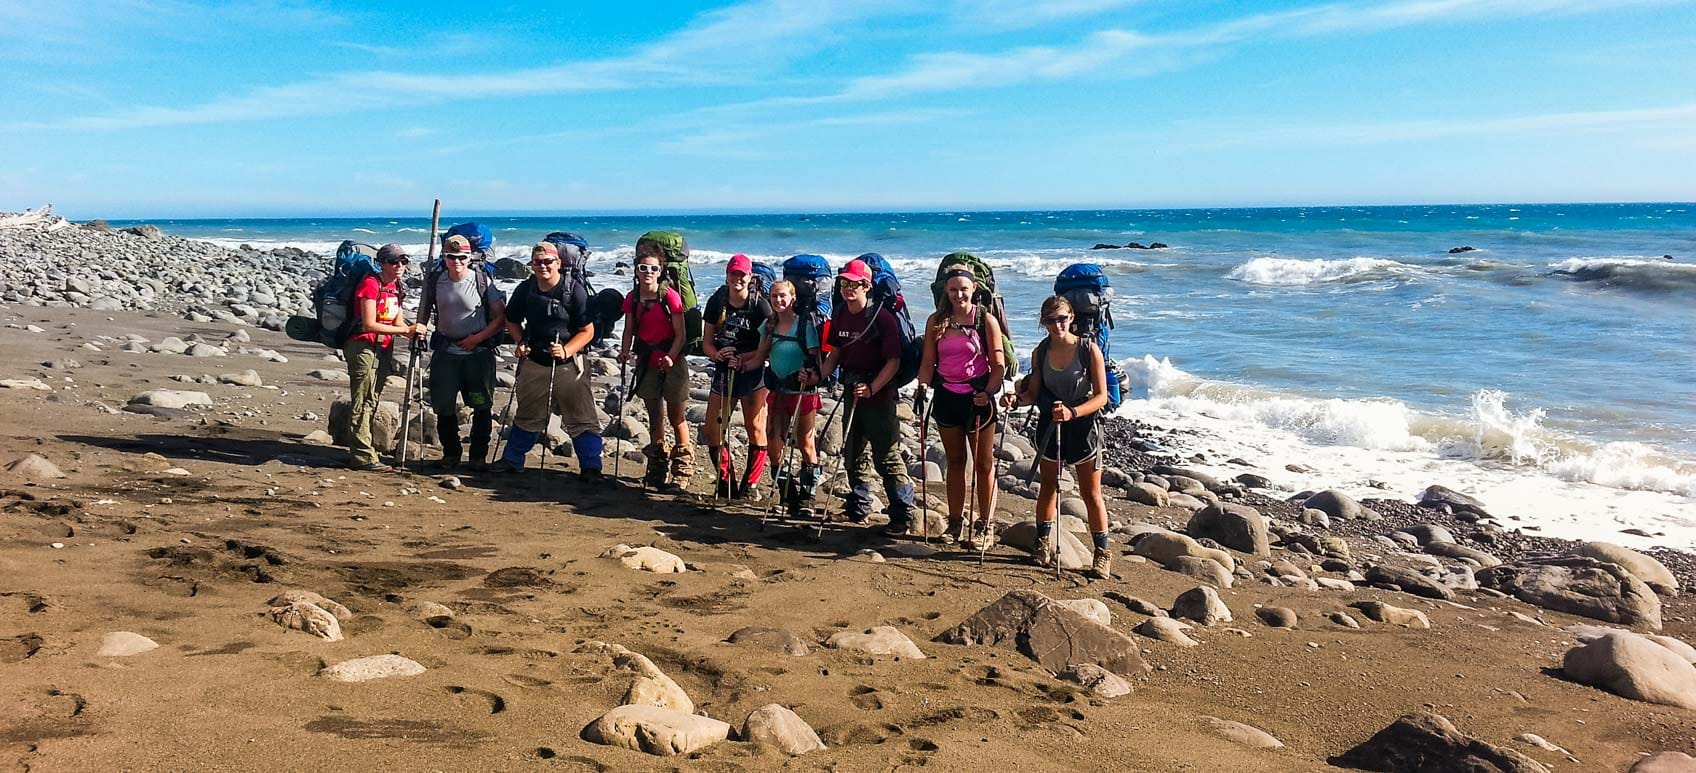 hikers-on-beach